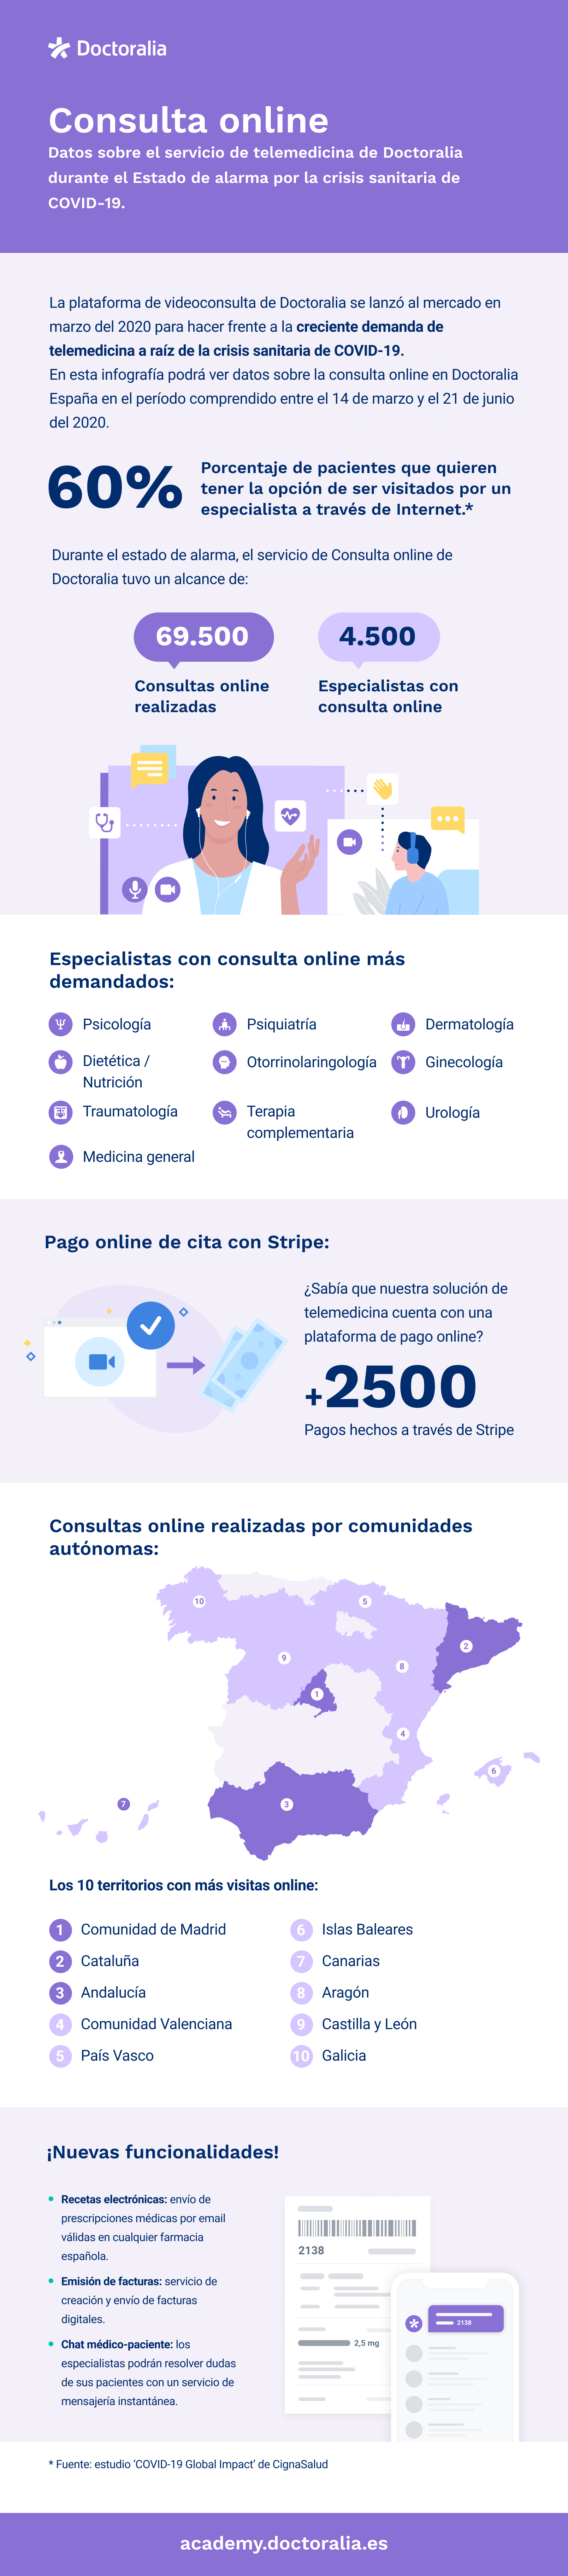 es-infographic-online-consultation-academy@2x (1)